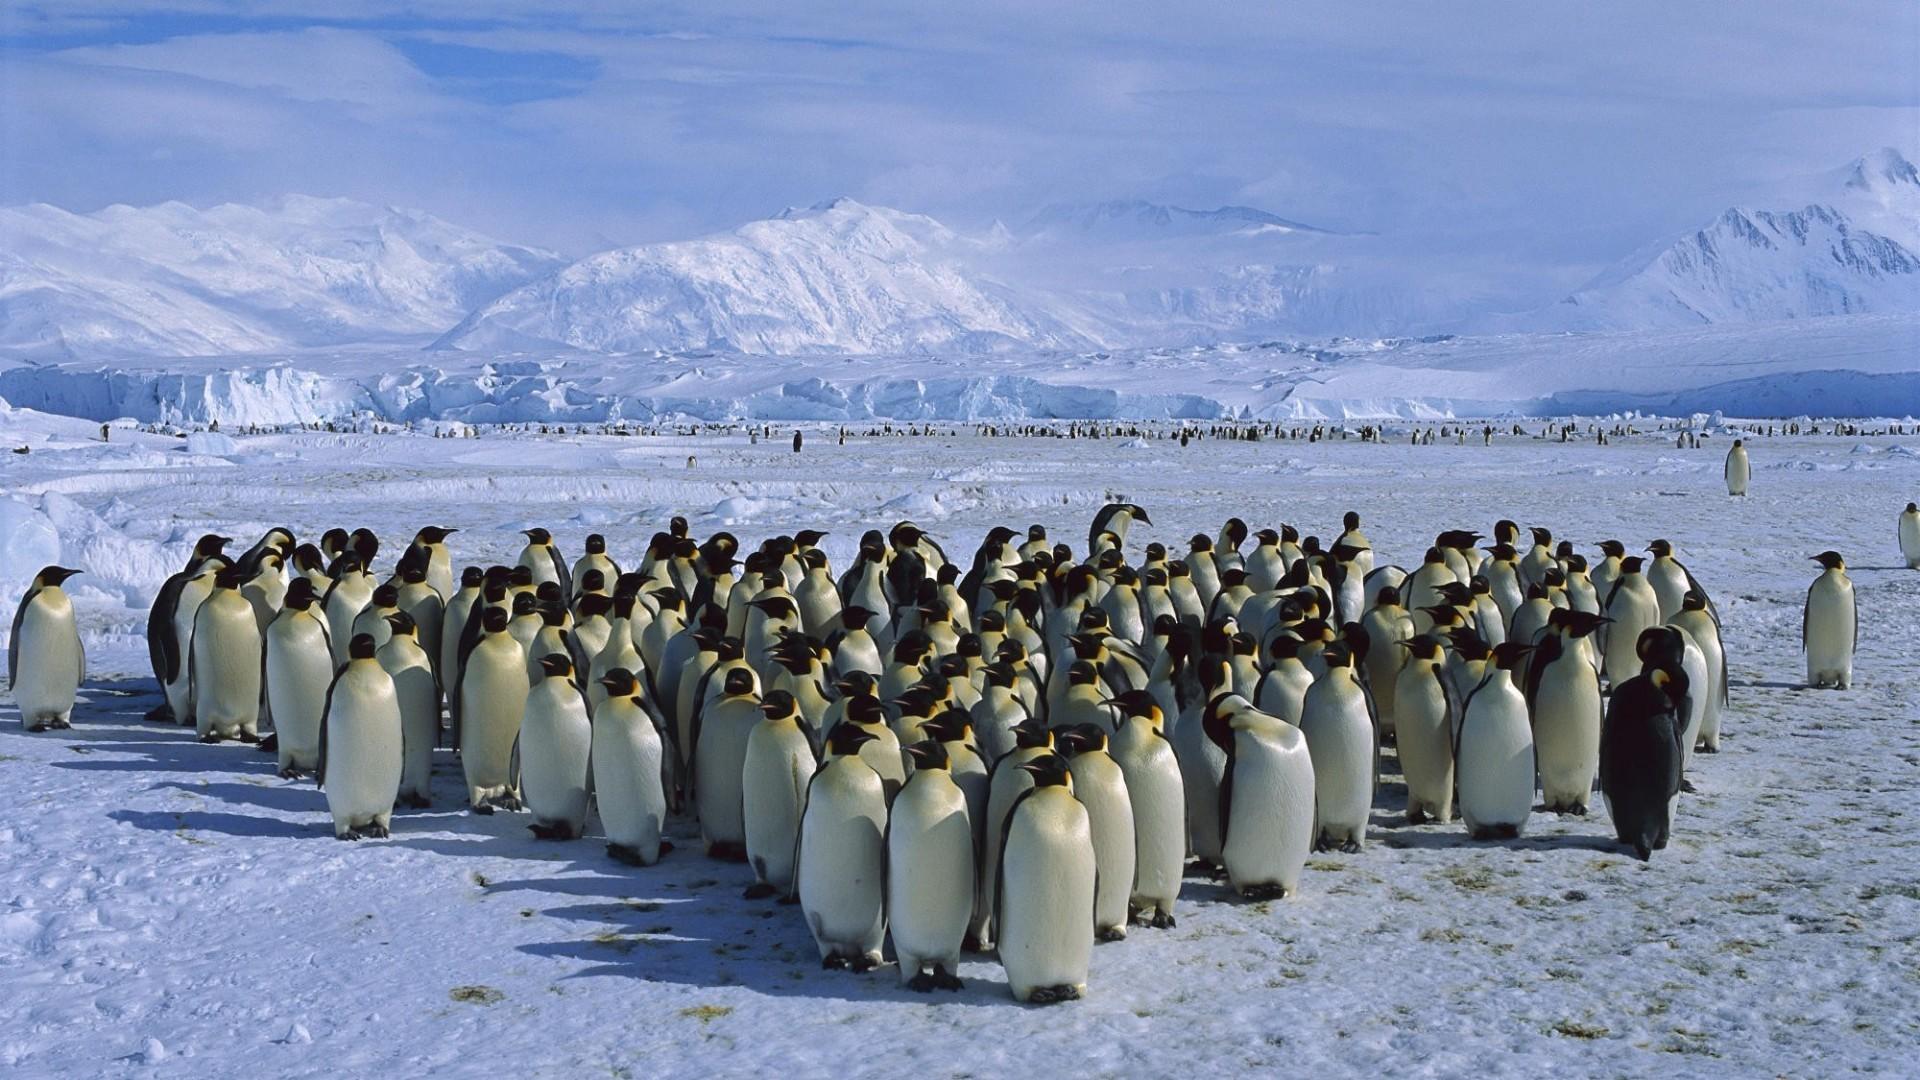 General 1920x1080 birds snow penguins Antarctica mountains